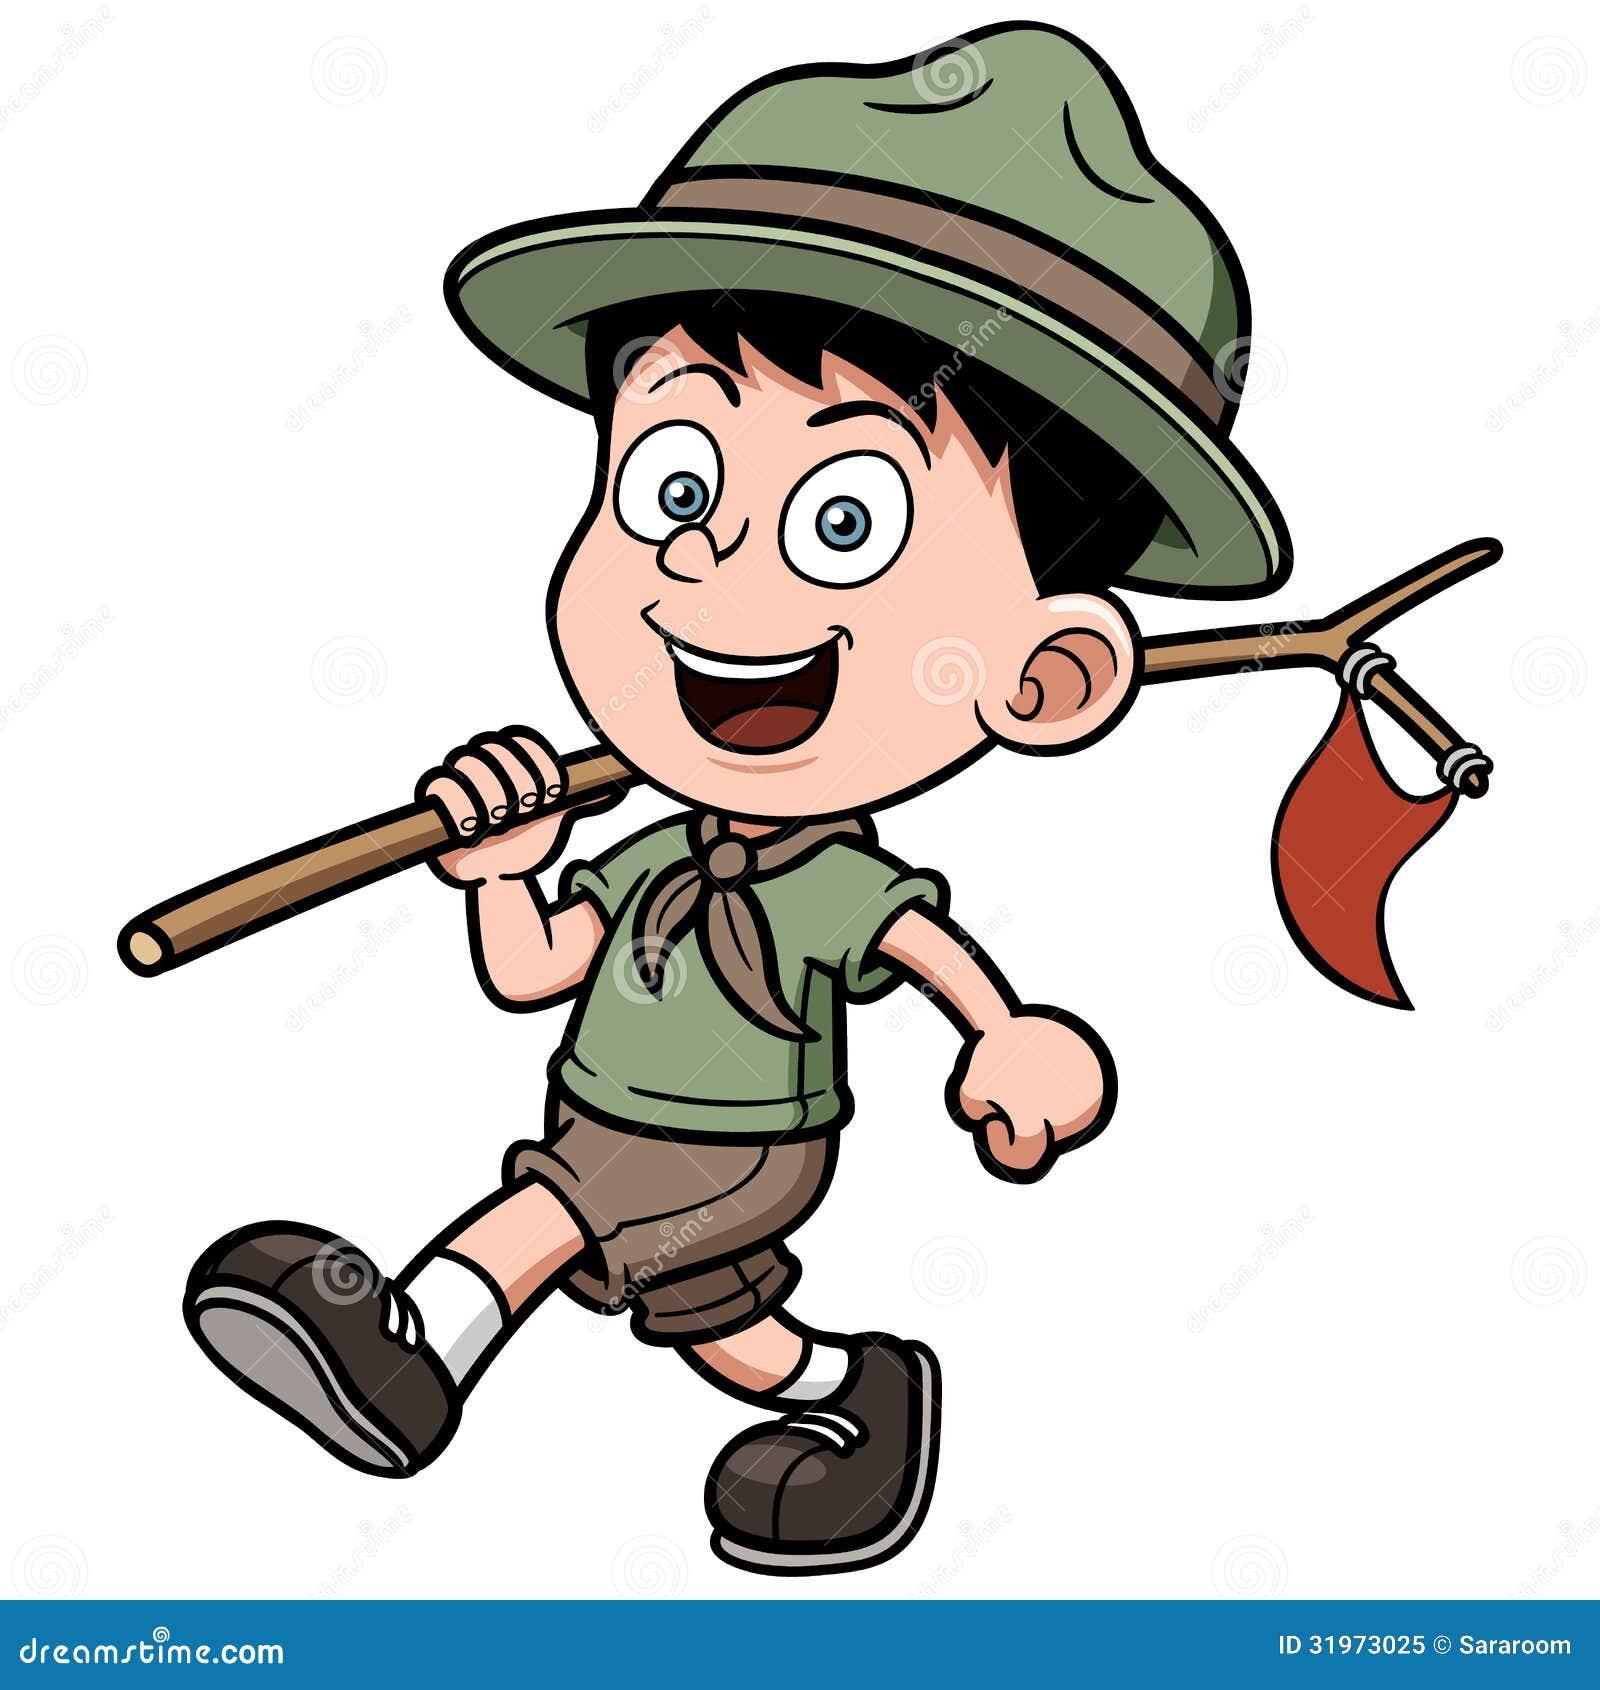 boy scout royalty free stock photo   image 31973025